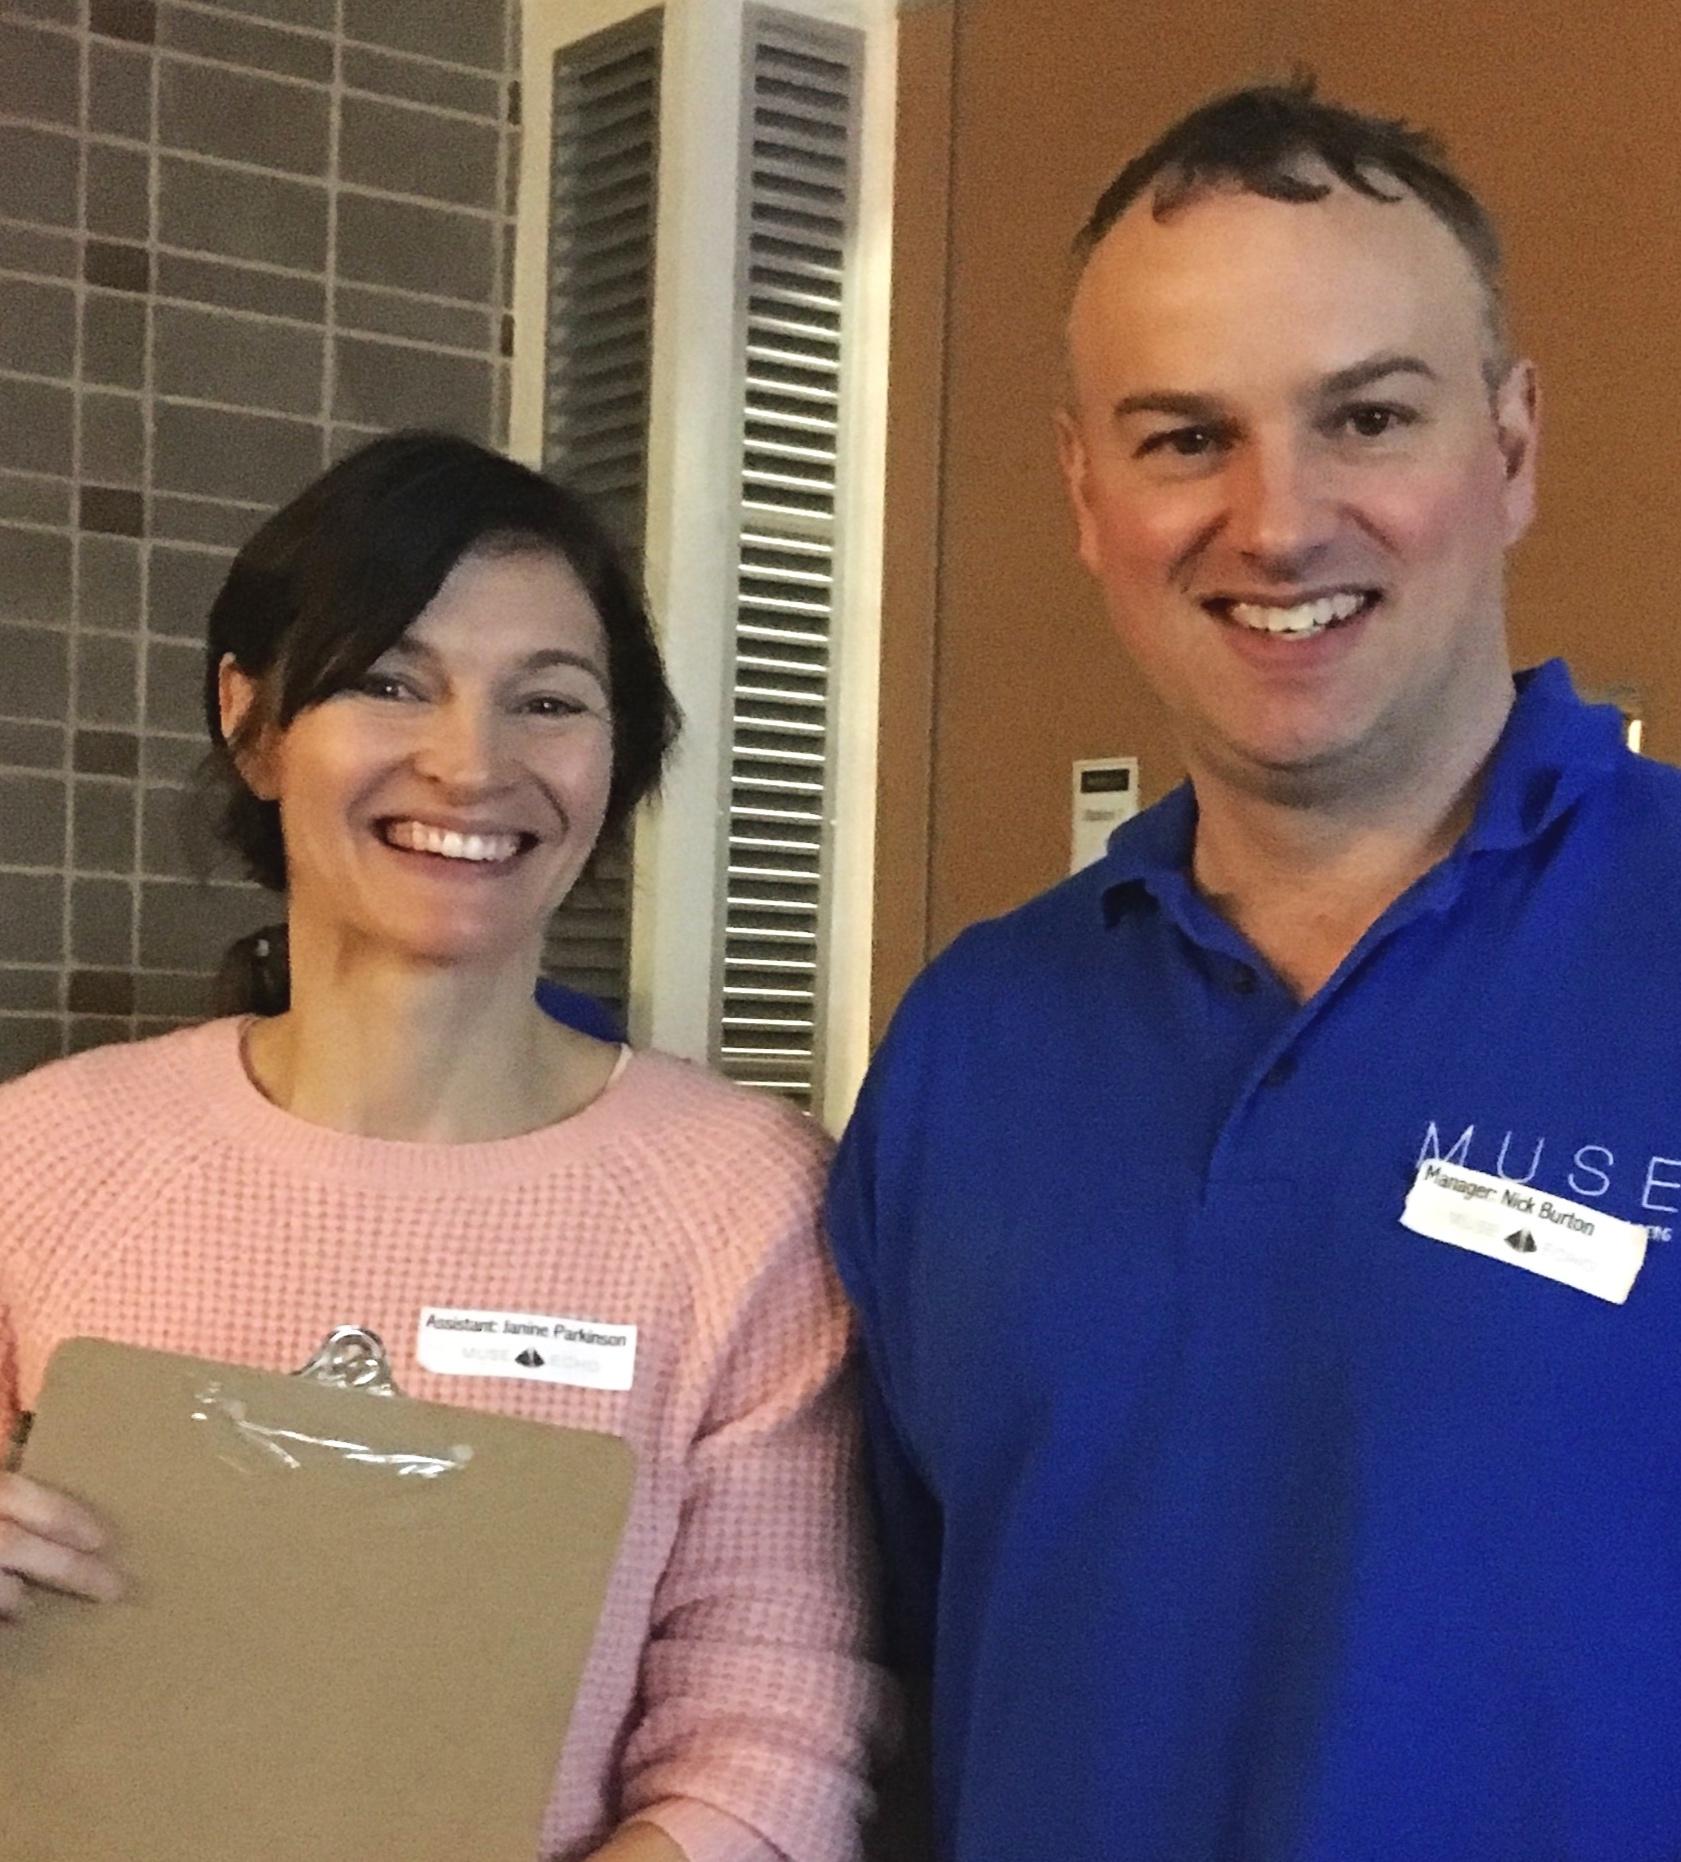 Janine Parkinson (Course Assistant) and Nick Burton (Course Manager)